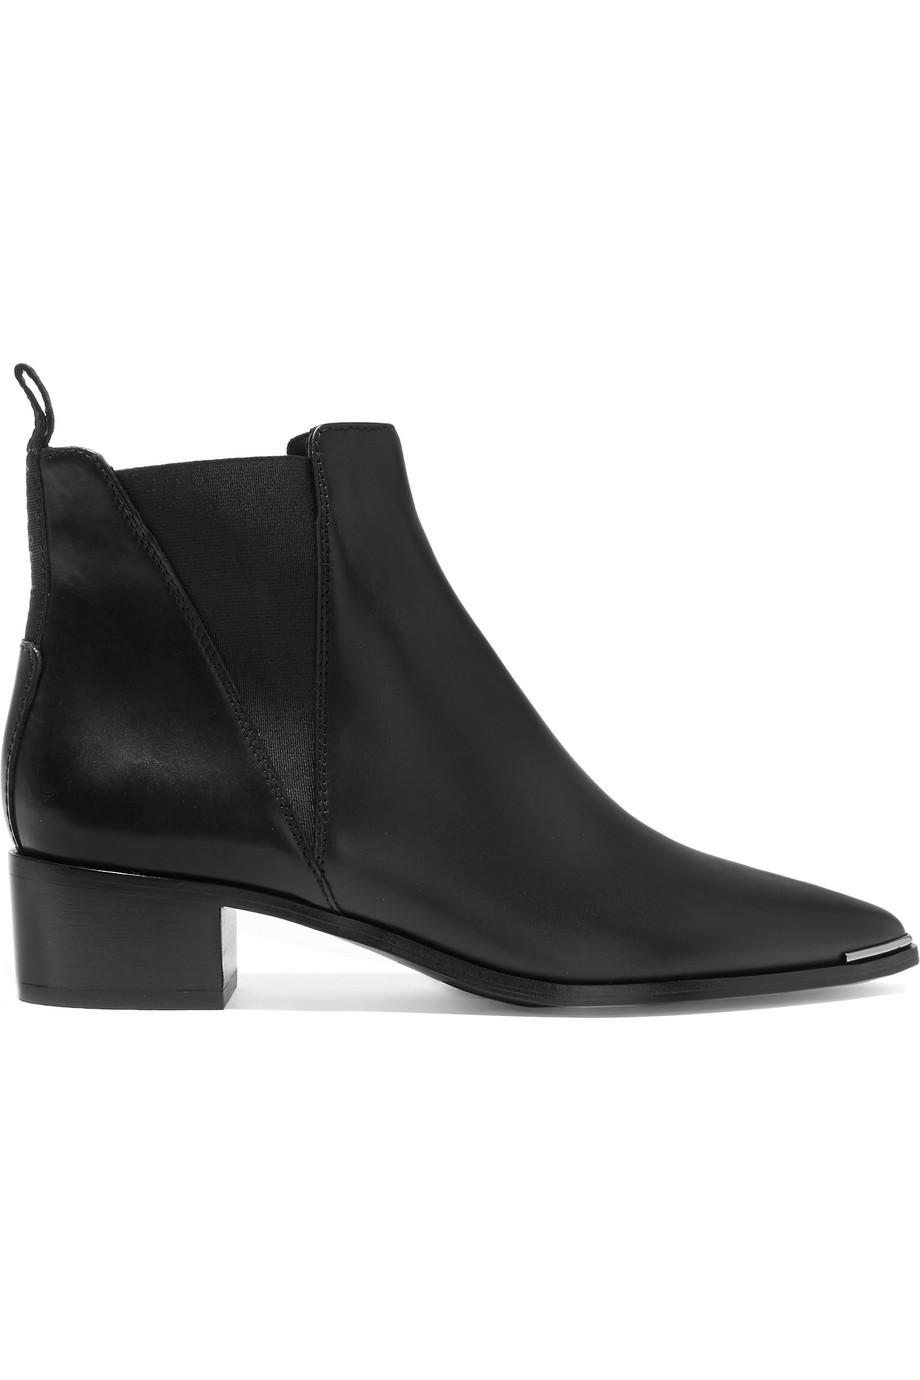 Acne Studios Jensen Leather Ankle Boots, Black, Women's US Size: 5.5, Size: 36